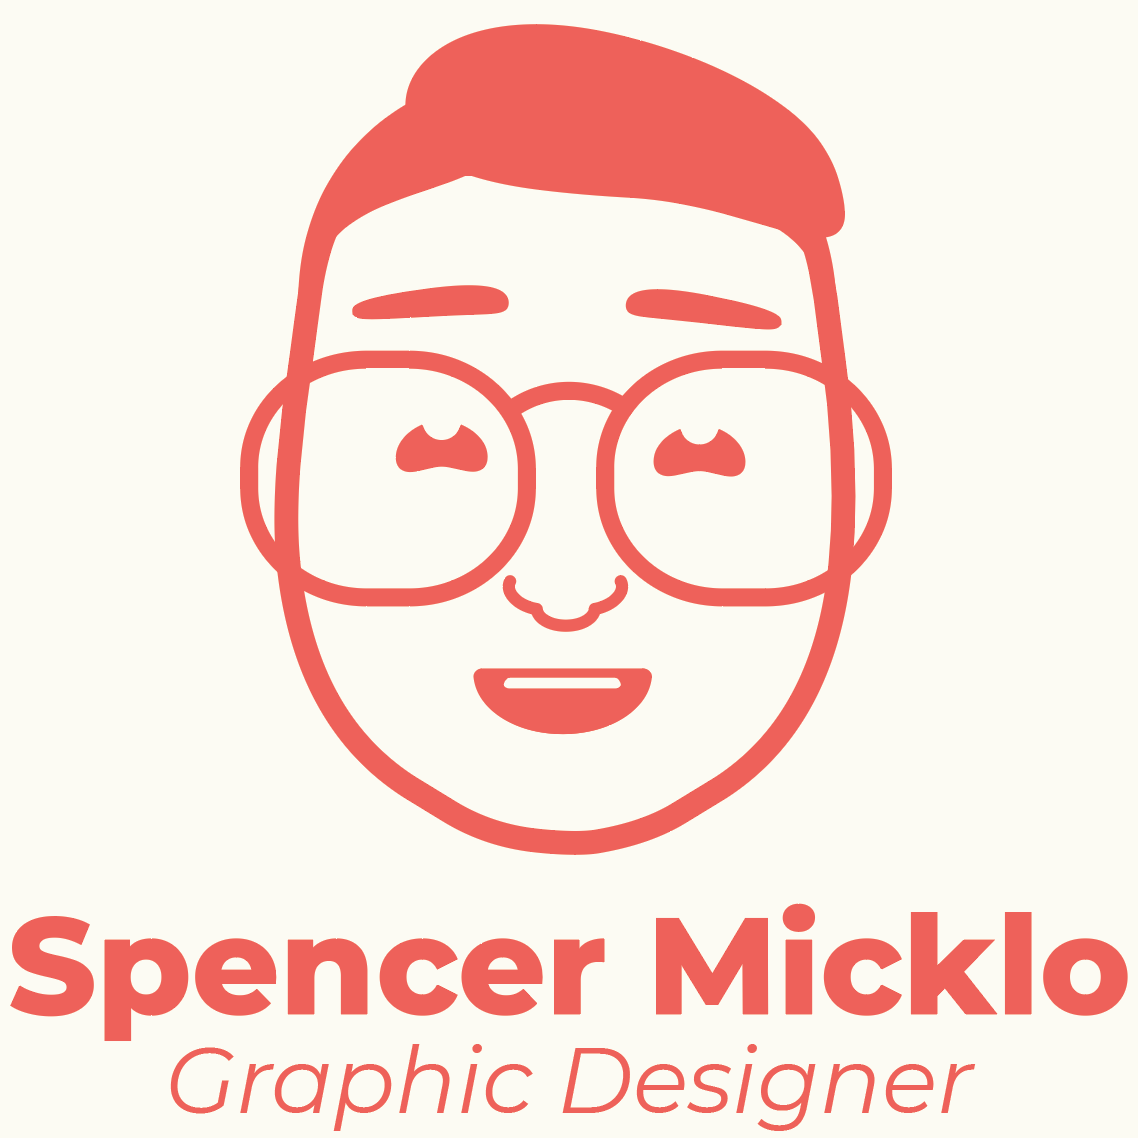 Spencer Micklo